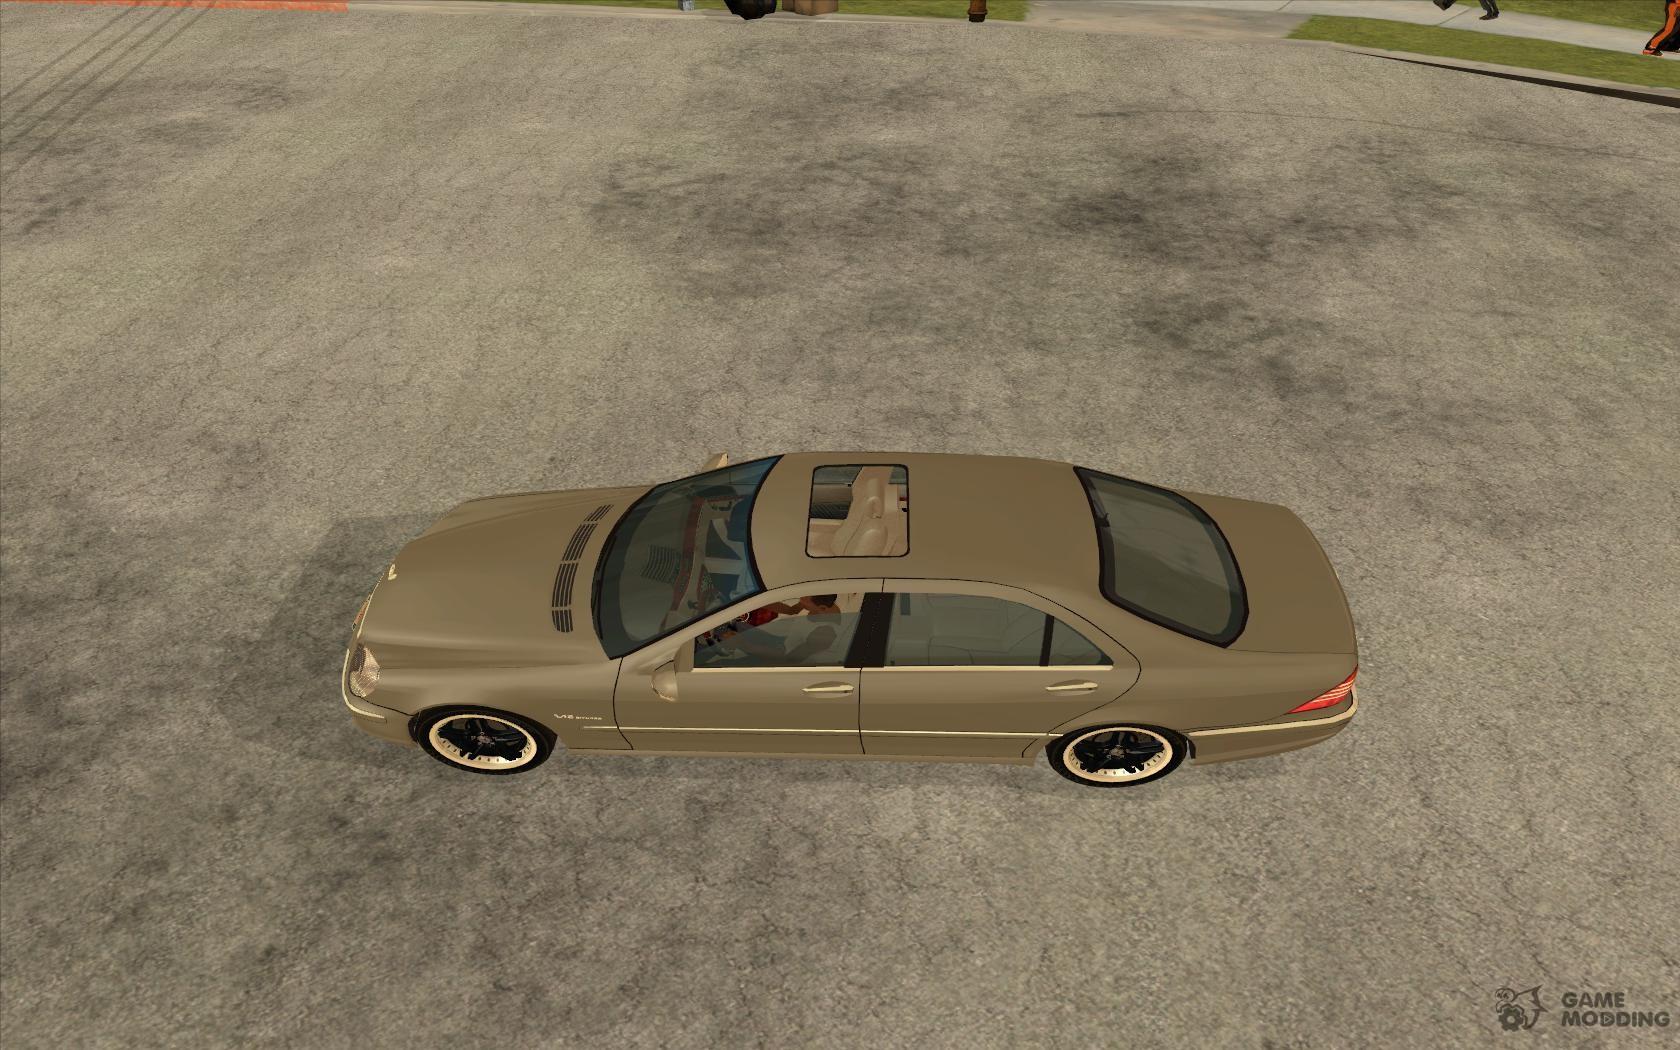 Mercedes Benz Amg S65 Dub For Gta San Andreas | Auto ... - photo#23